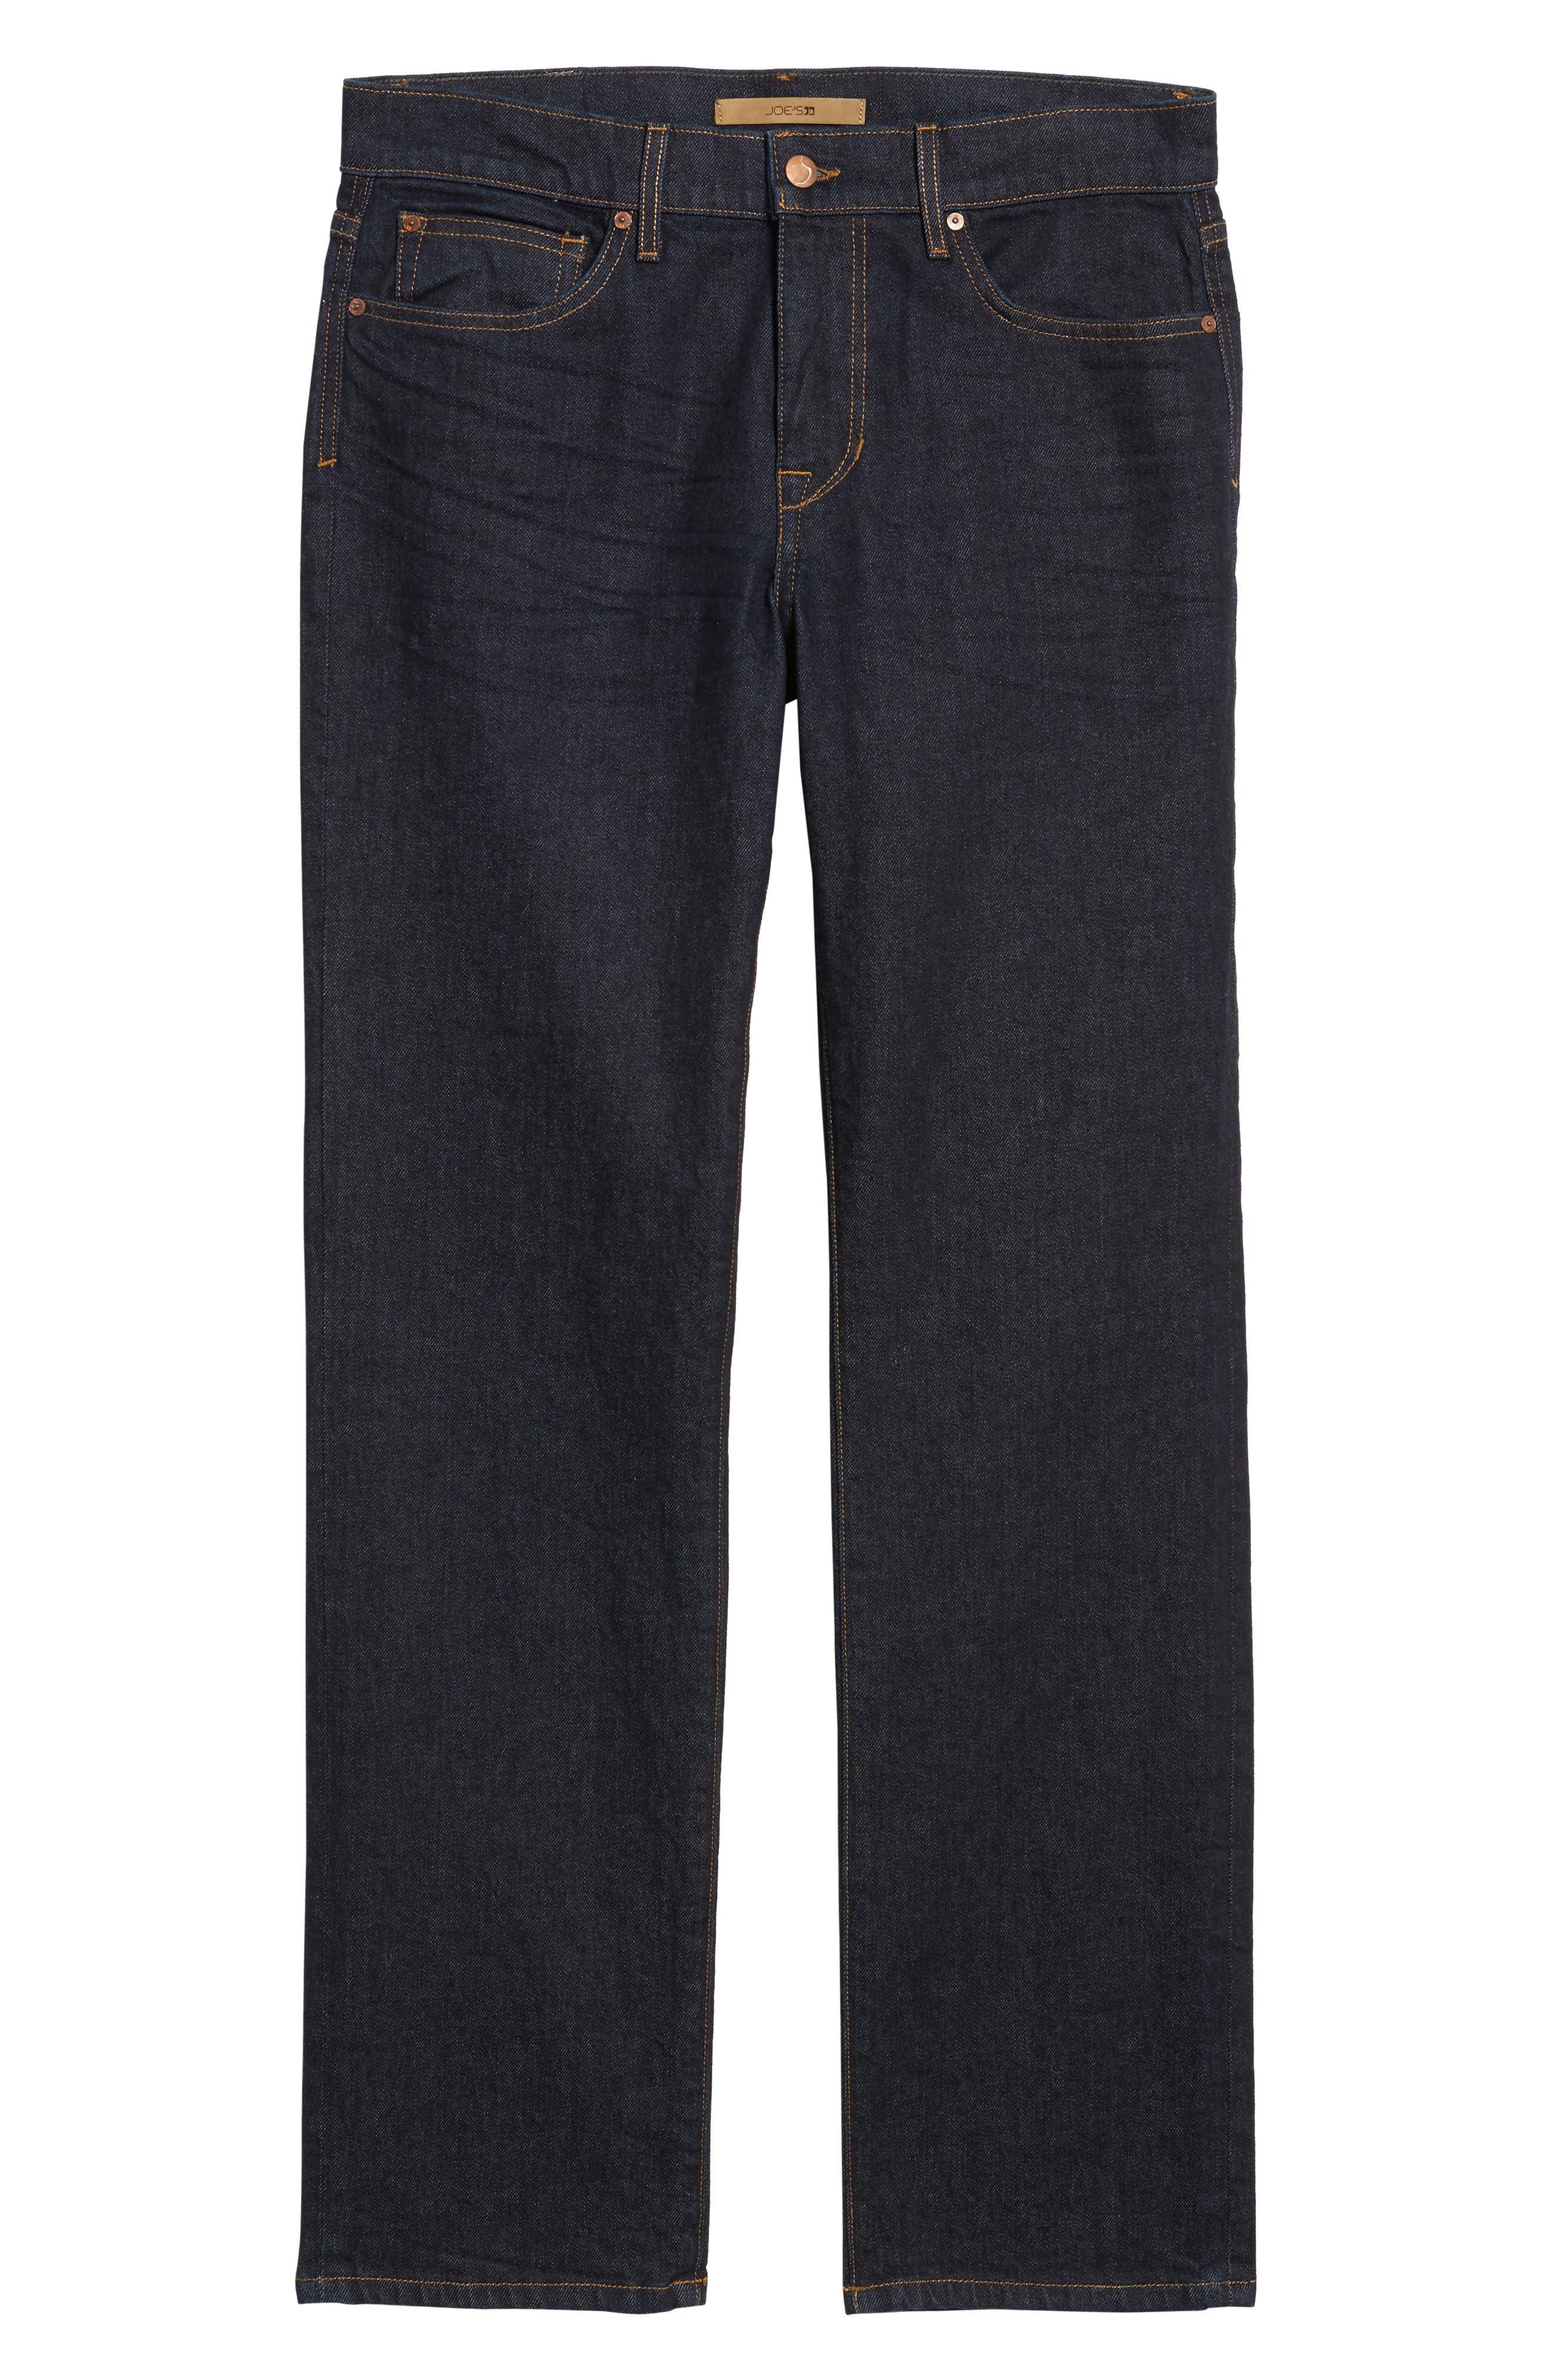 Brixton Slim Straight Leg Jeans,                             Alternate thumbnail 6, color,                             400